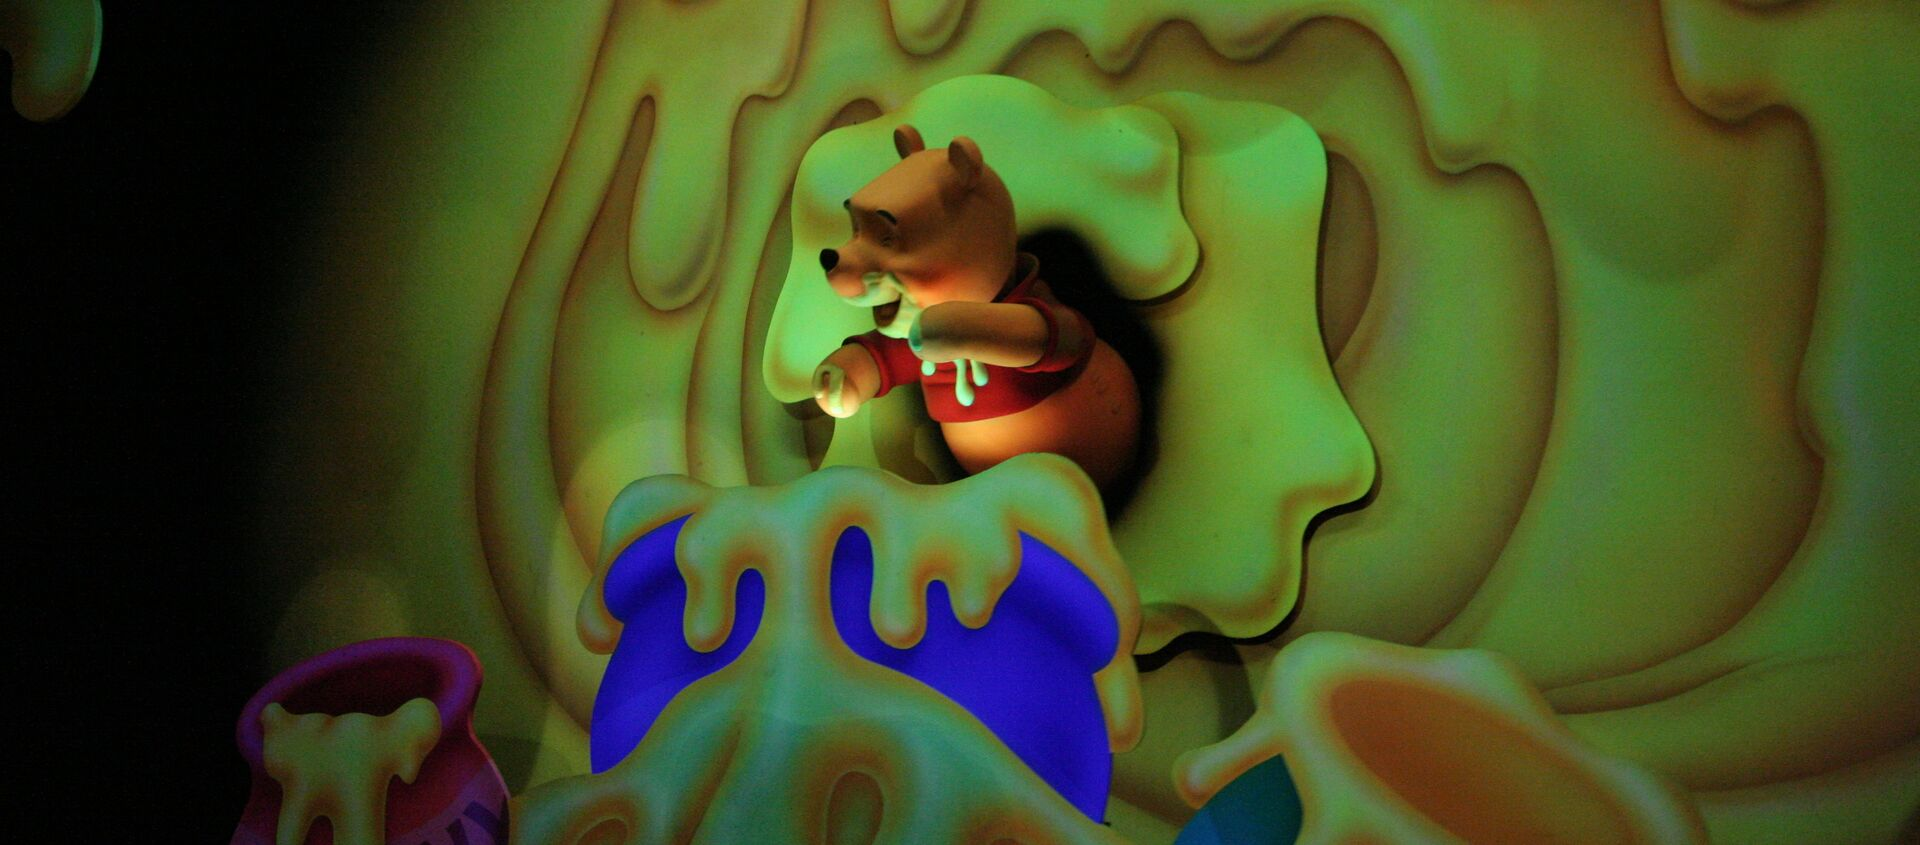 Winnie the Pooh, imagen referencial - Sputnik Mundo, 1920, 04.08.2018